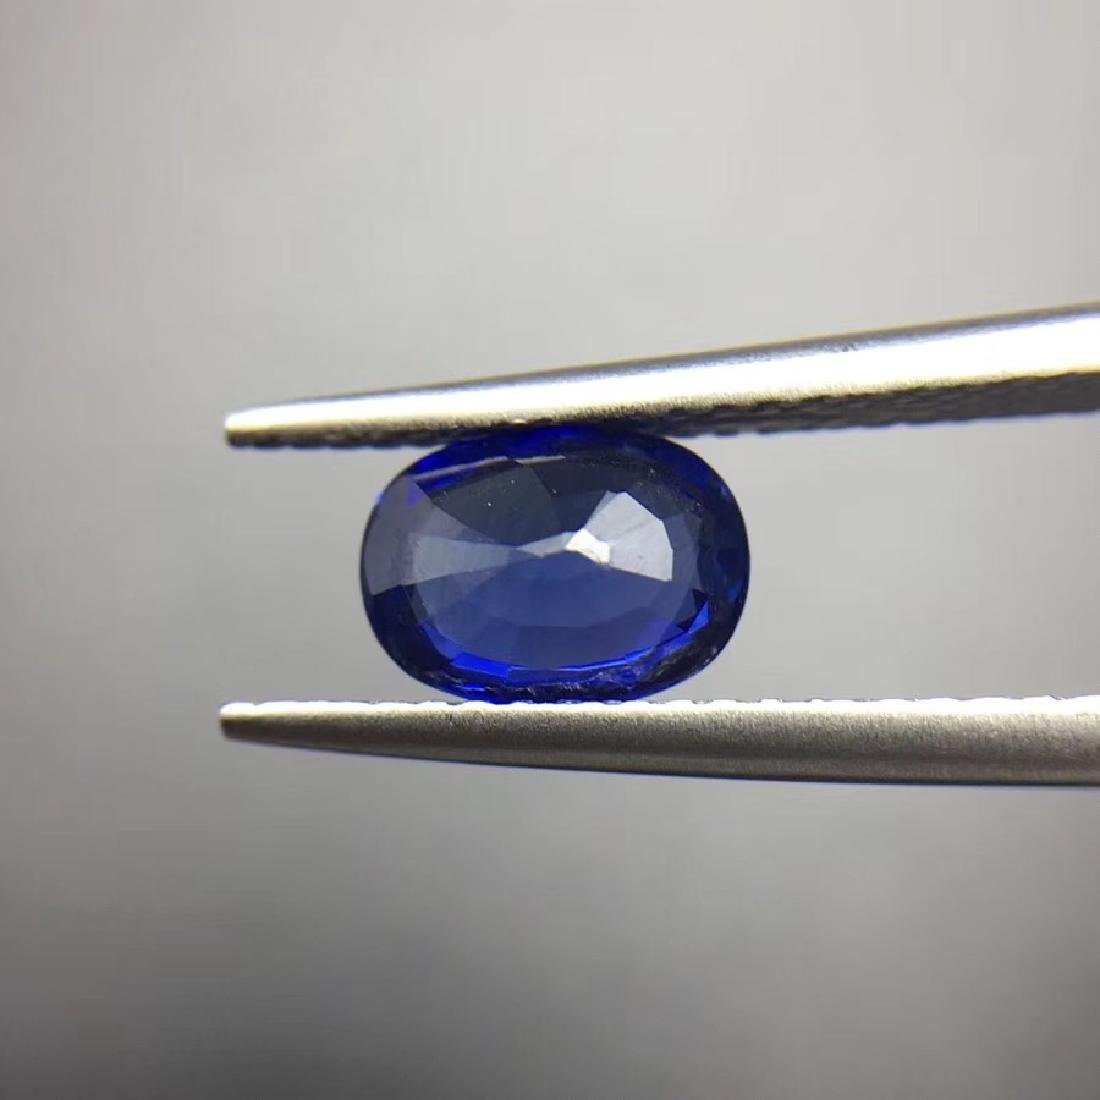 1.45 ct Sapphire 5.5*7.4*3.5 mm Oval Cut - 4